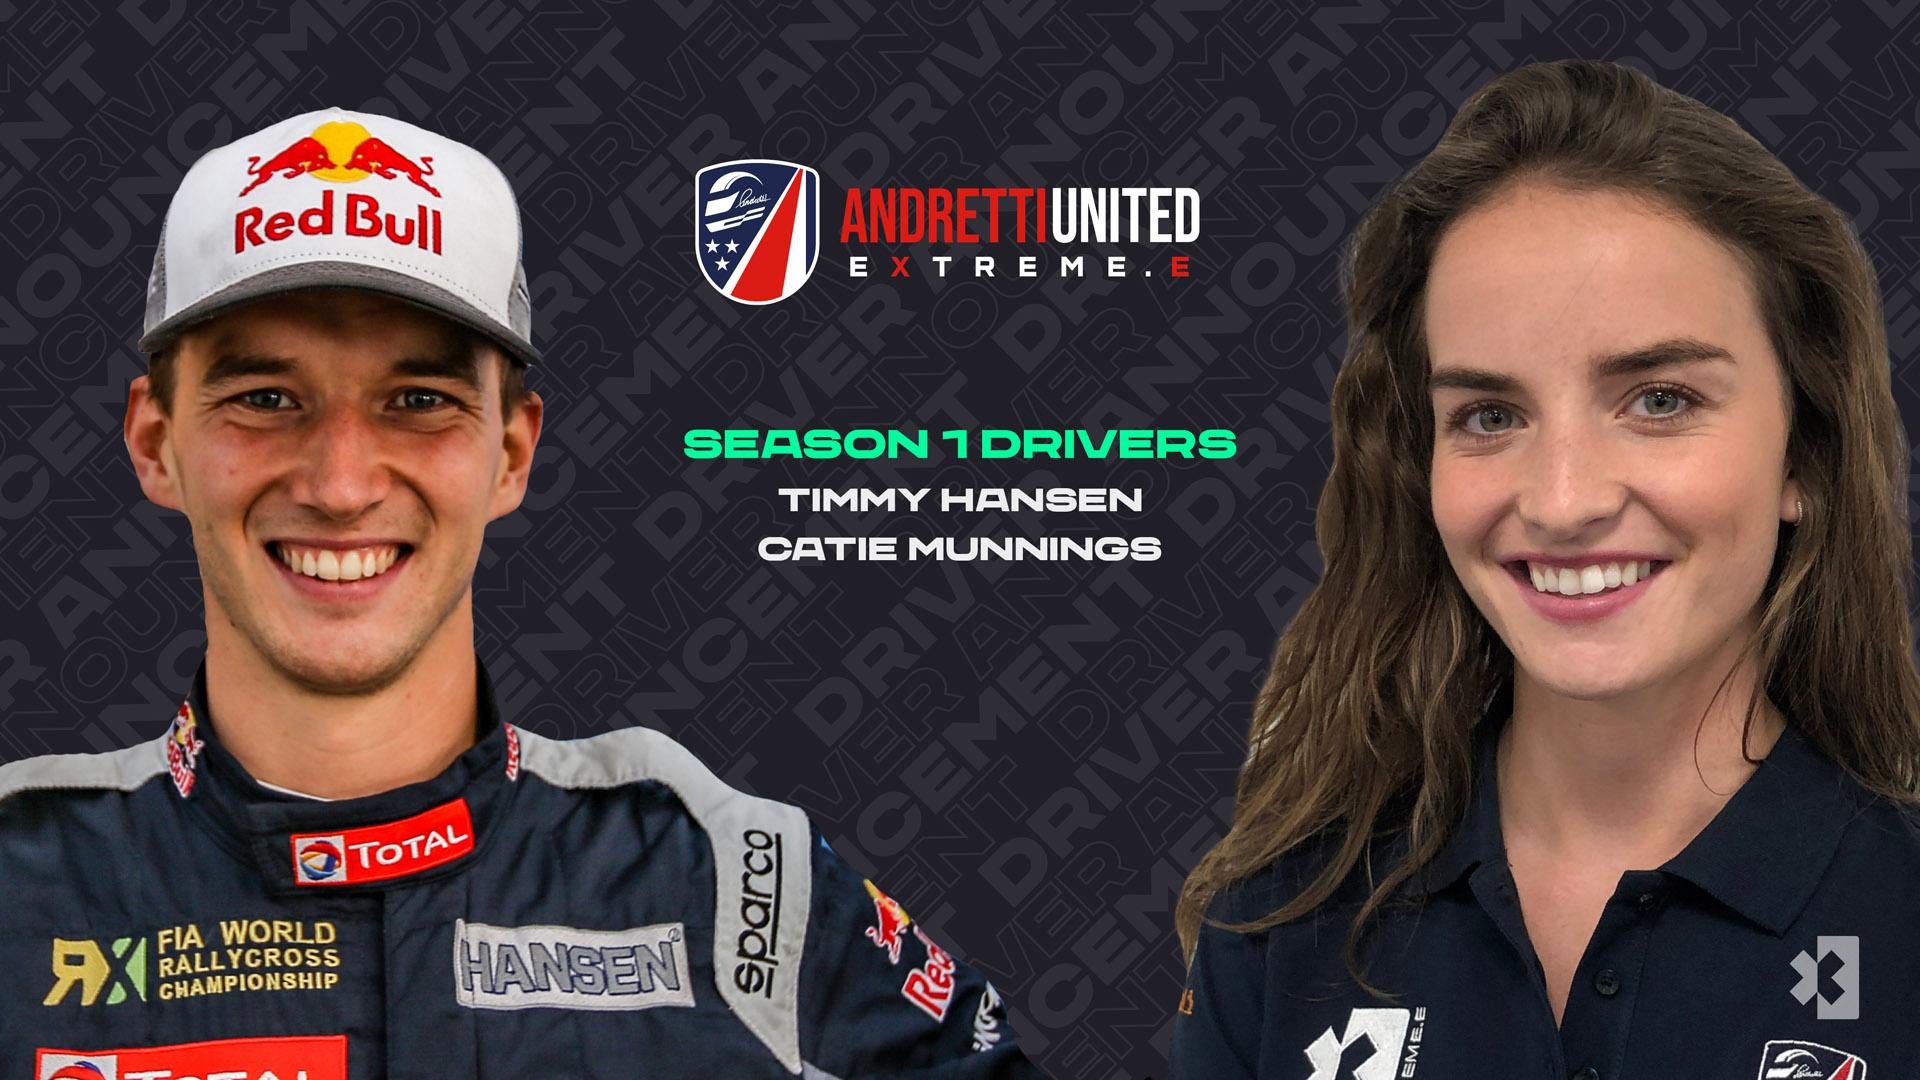 Andretti United drivers